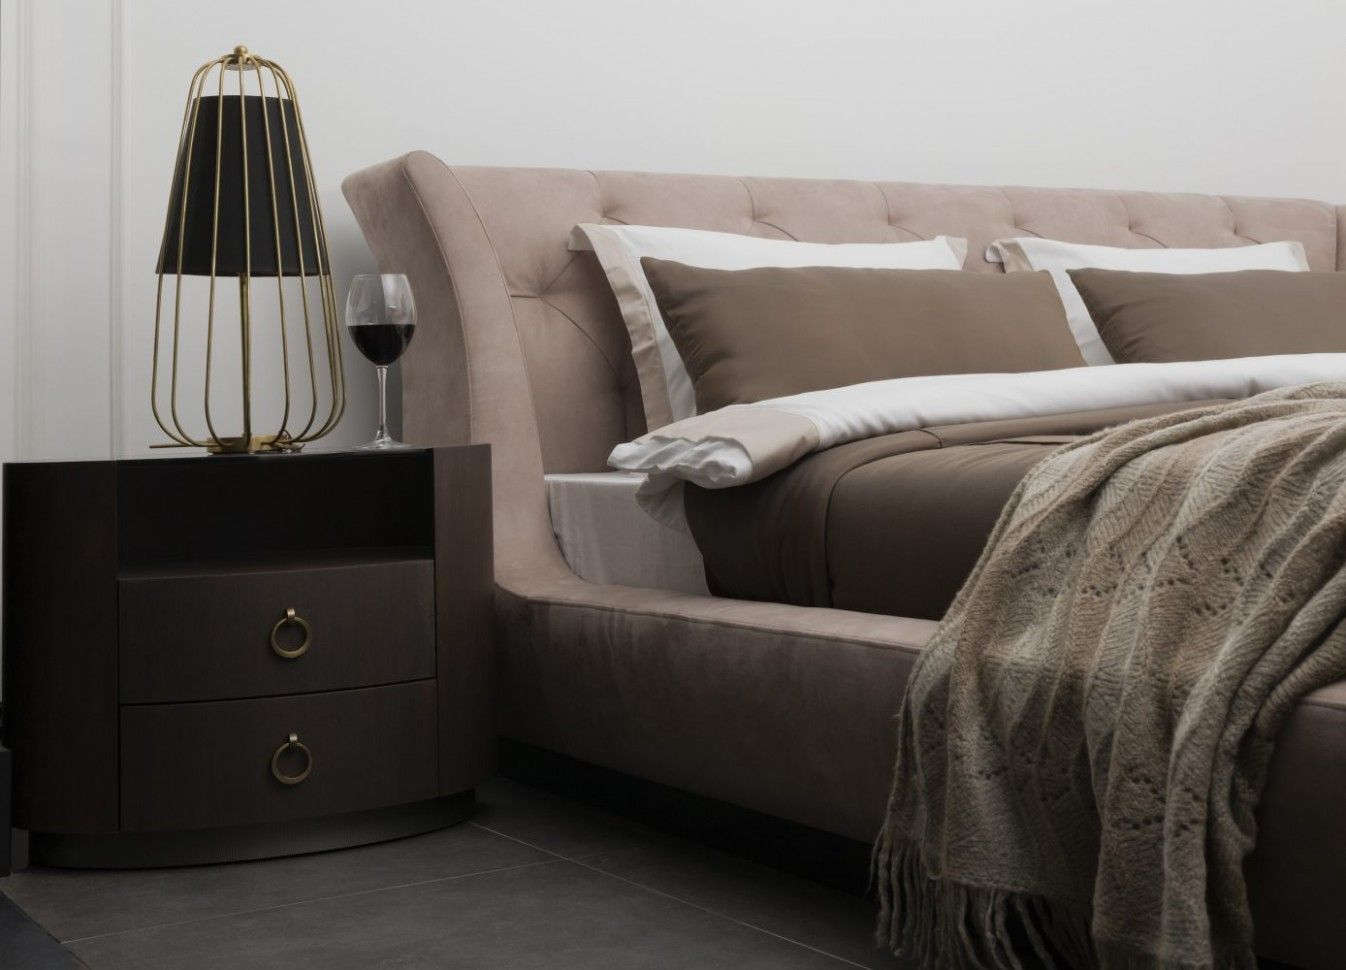 Modern Bedroom Furniture Nz in 7  Modern bedroom furniture